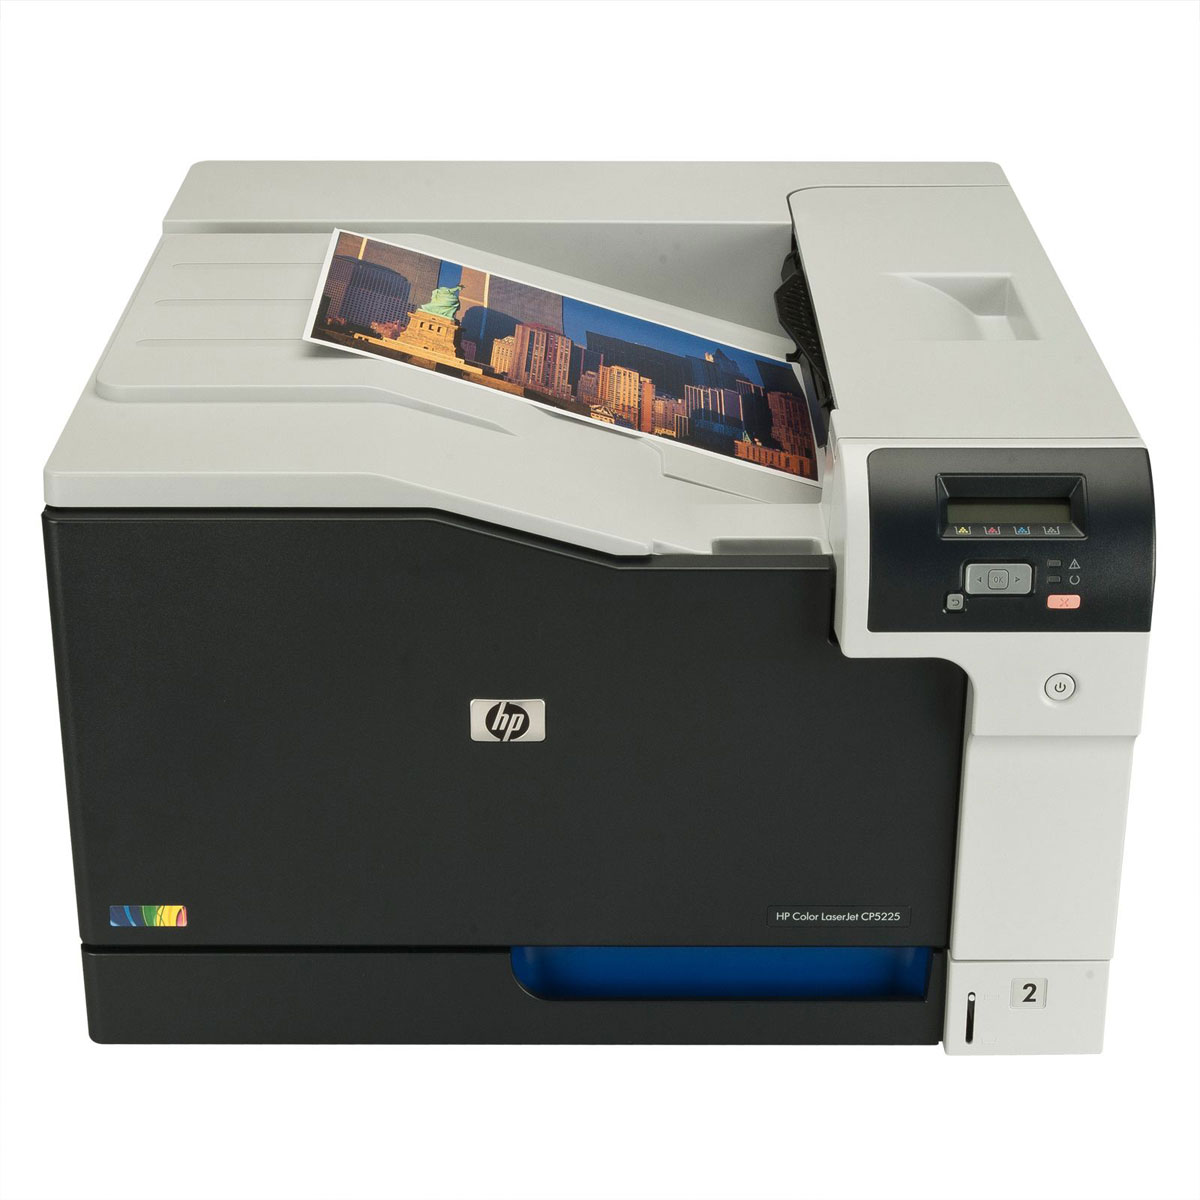 Imprimante HP Color LaserJet CP5225N